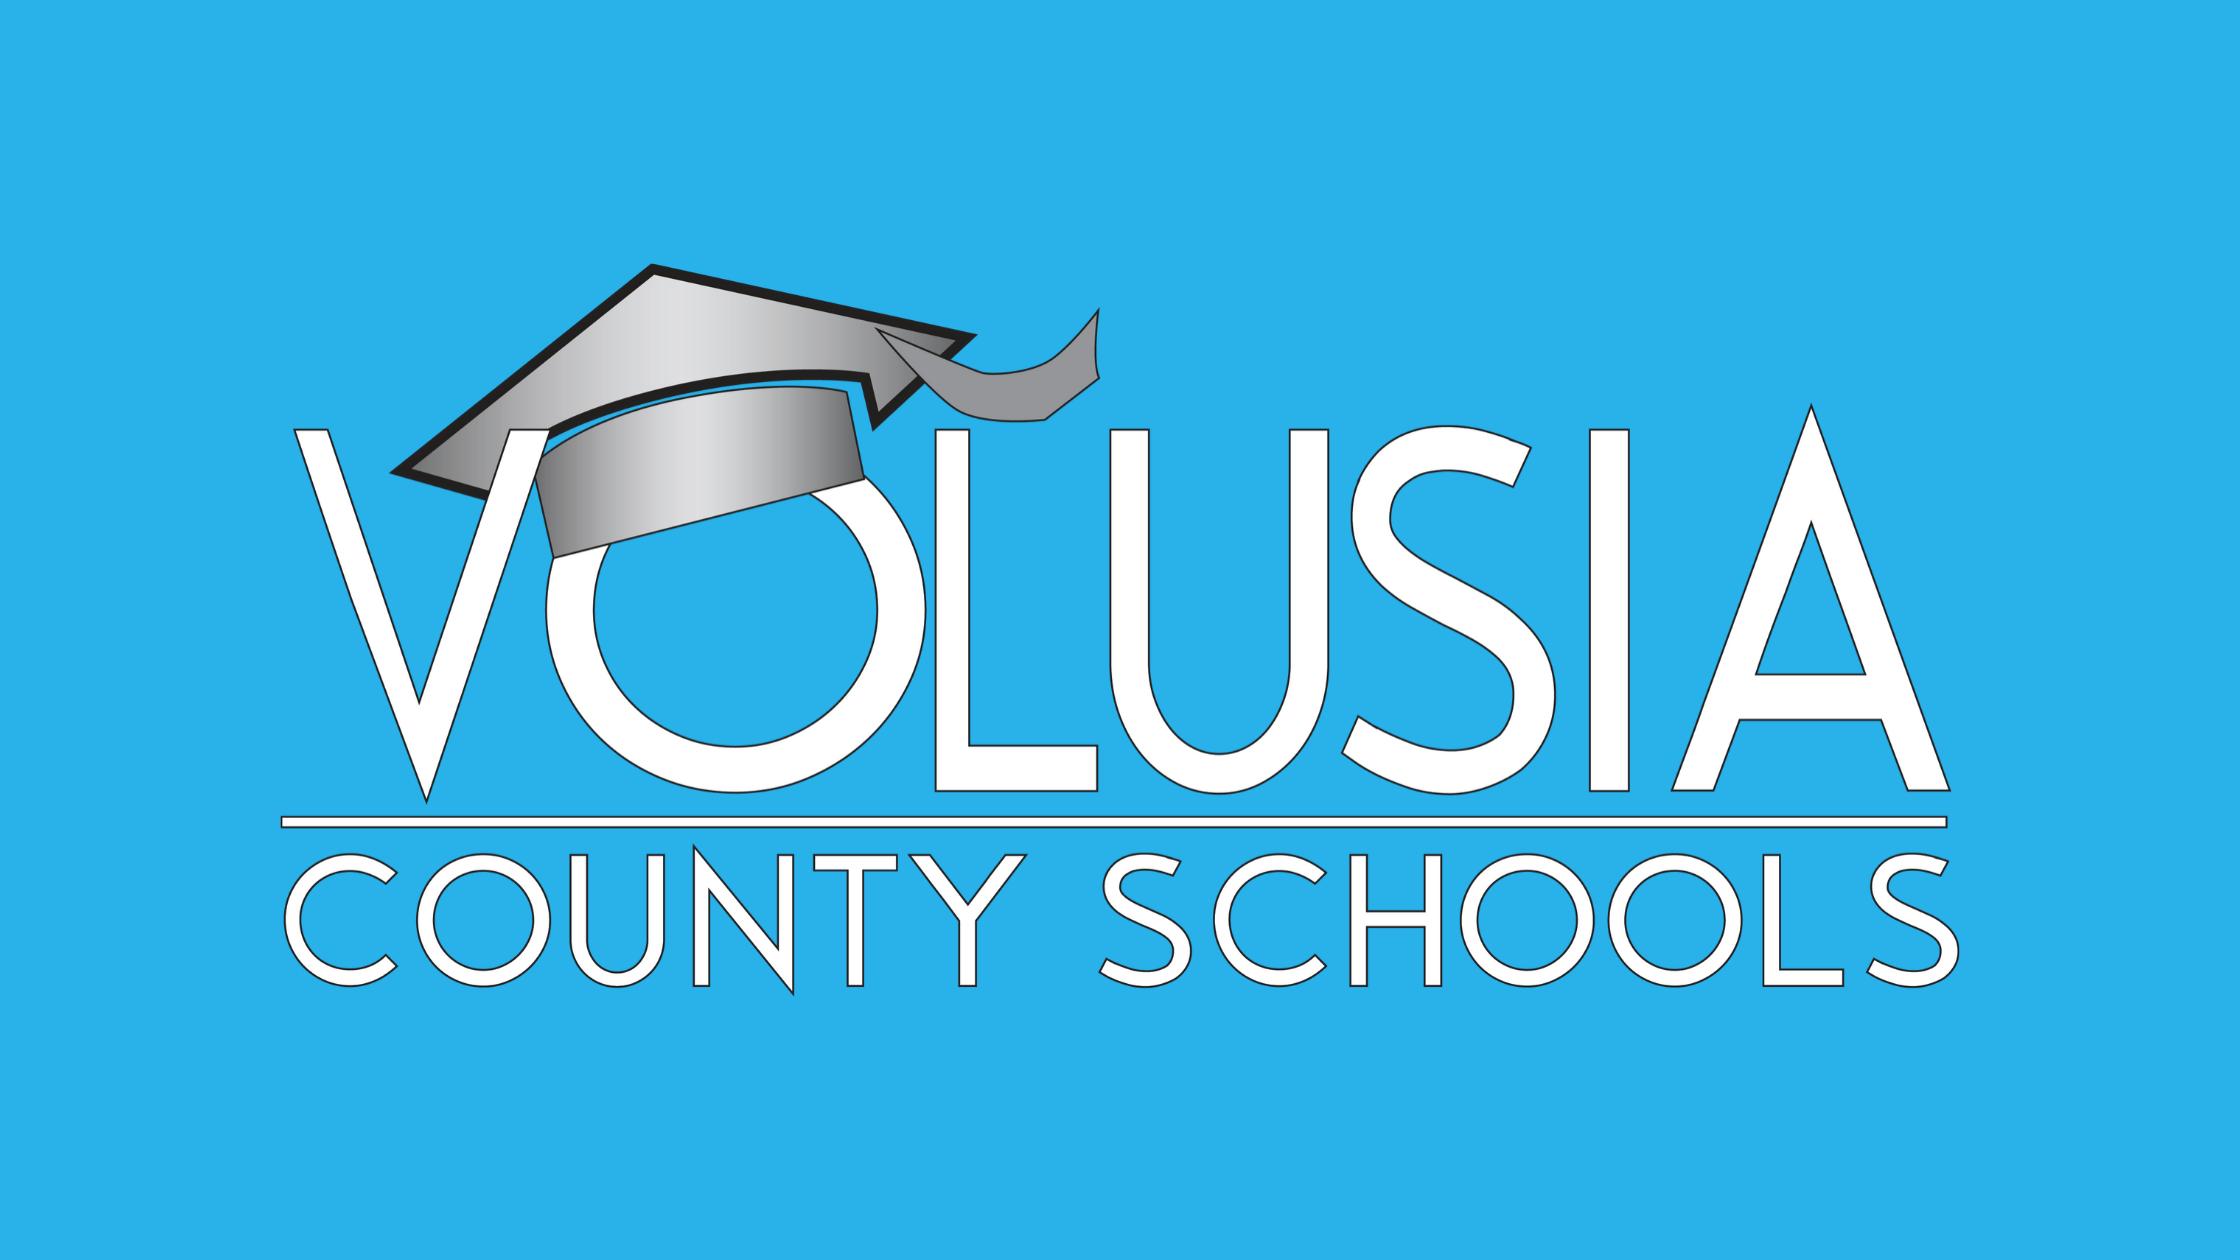 Volusia County Schools Calendar 2022.Volusia County Schools Fall Athletics Update The Volusia Mom